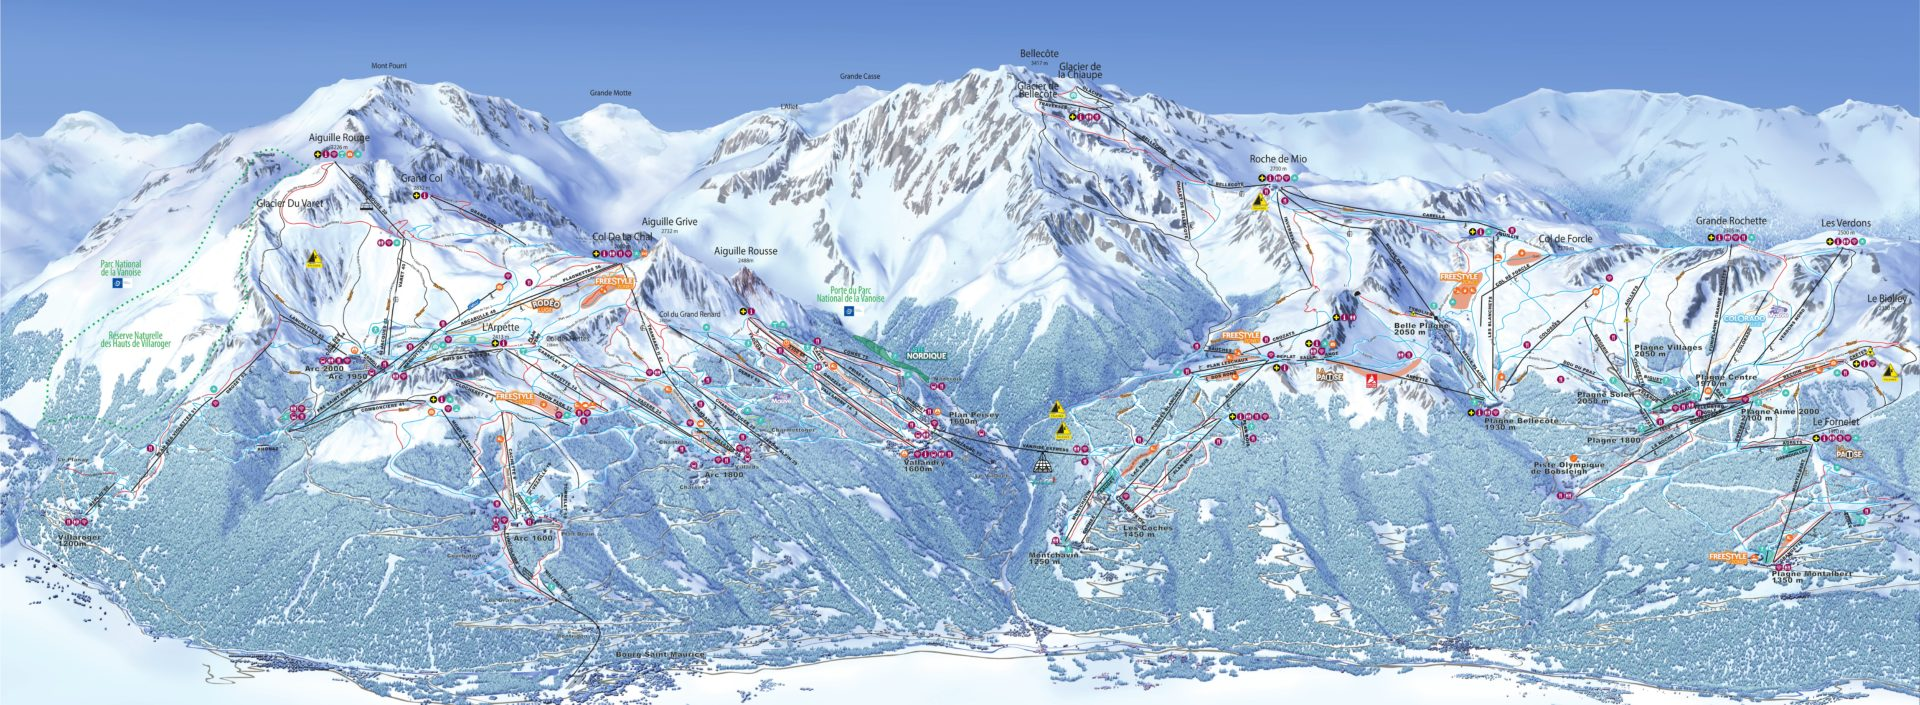 Pisteplattegrond Paradiski wintersport skivakantie luxe